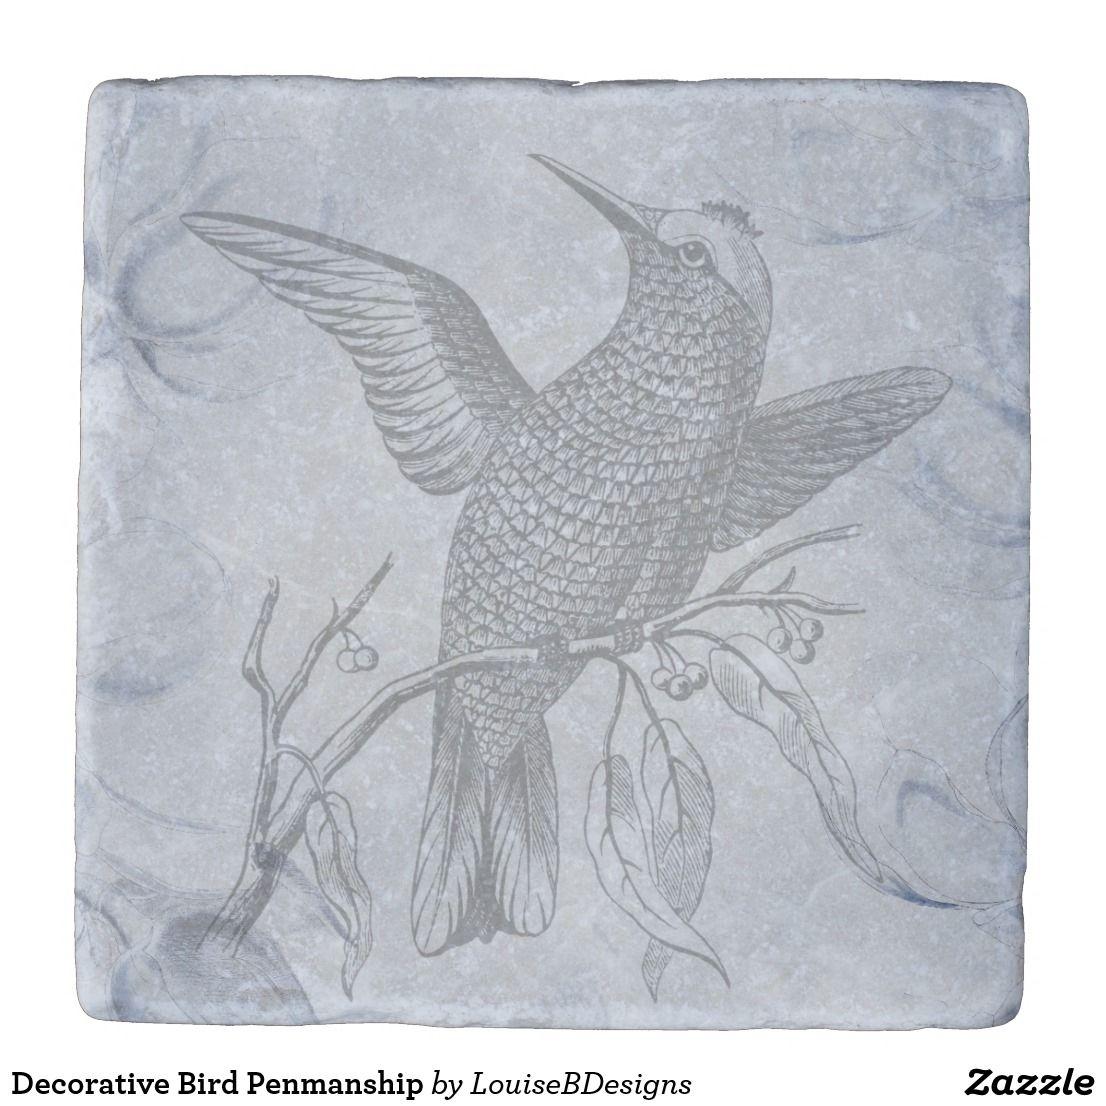 Decorative Bird Penmanship Stone Coaster